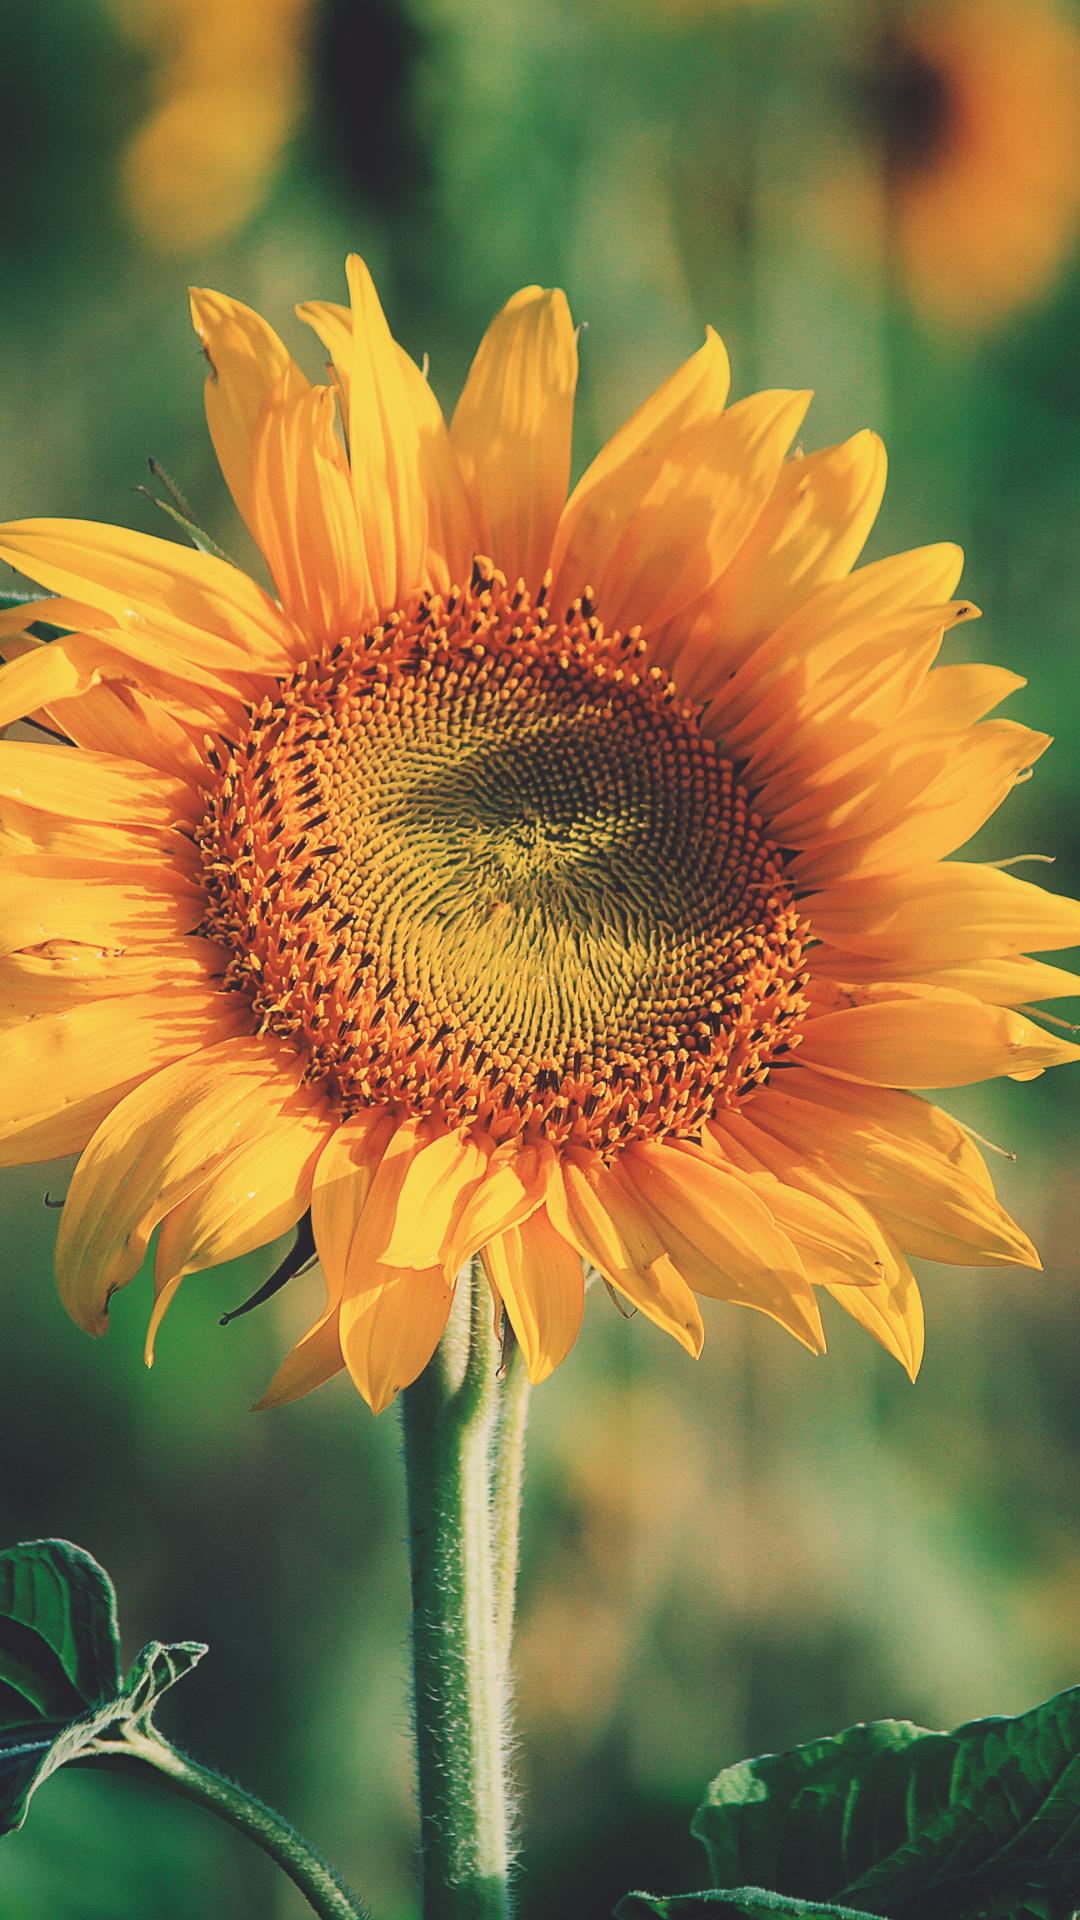 Robust Sunflower iPhone Wallpaper